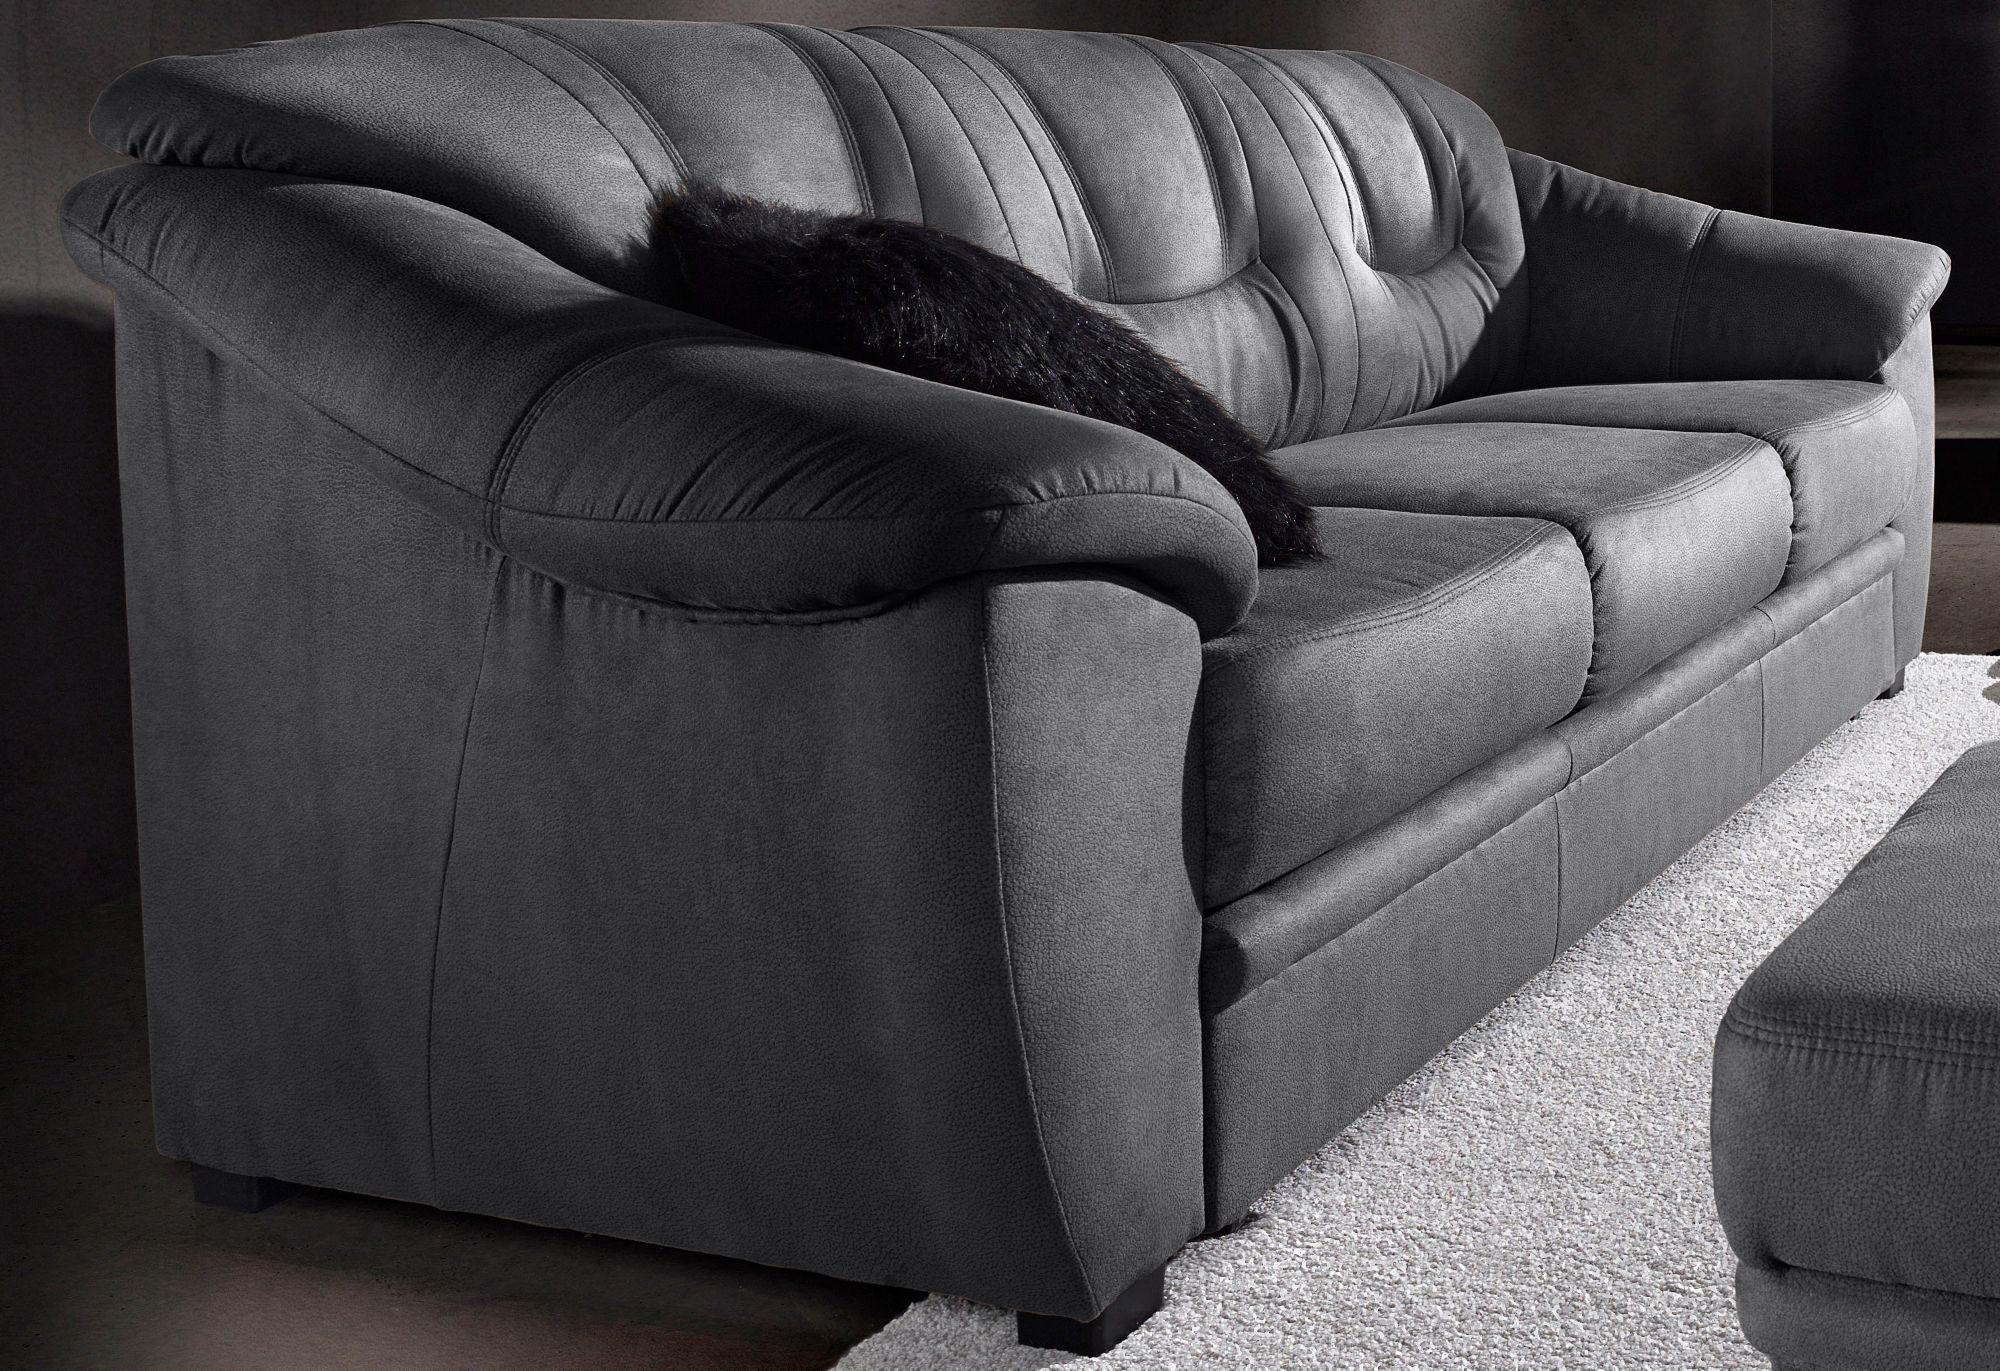 SITMORE 3-Sitzer, Sit & More, wahlweise mit Bettfunktion